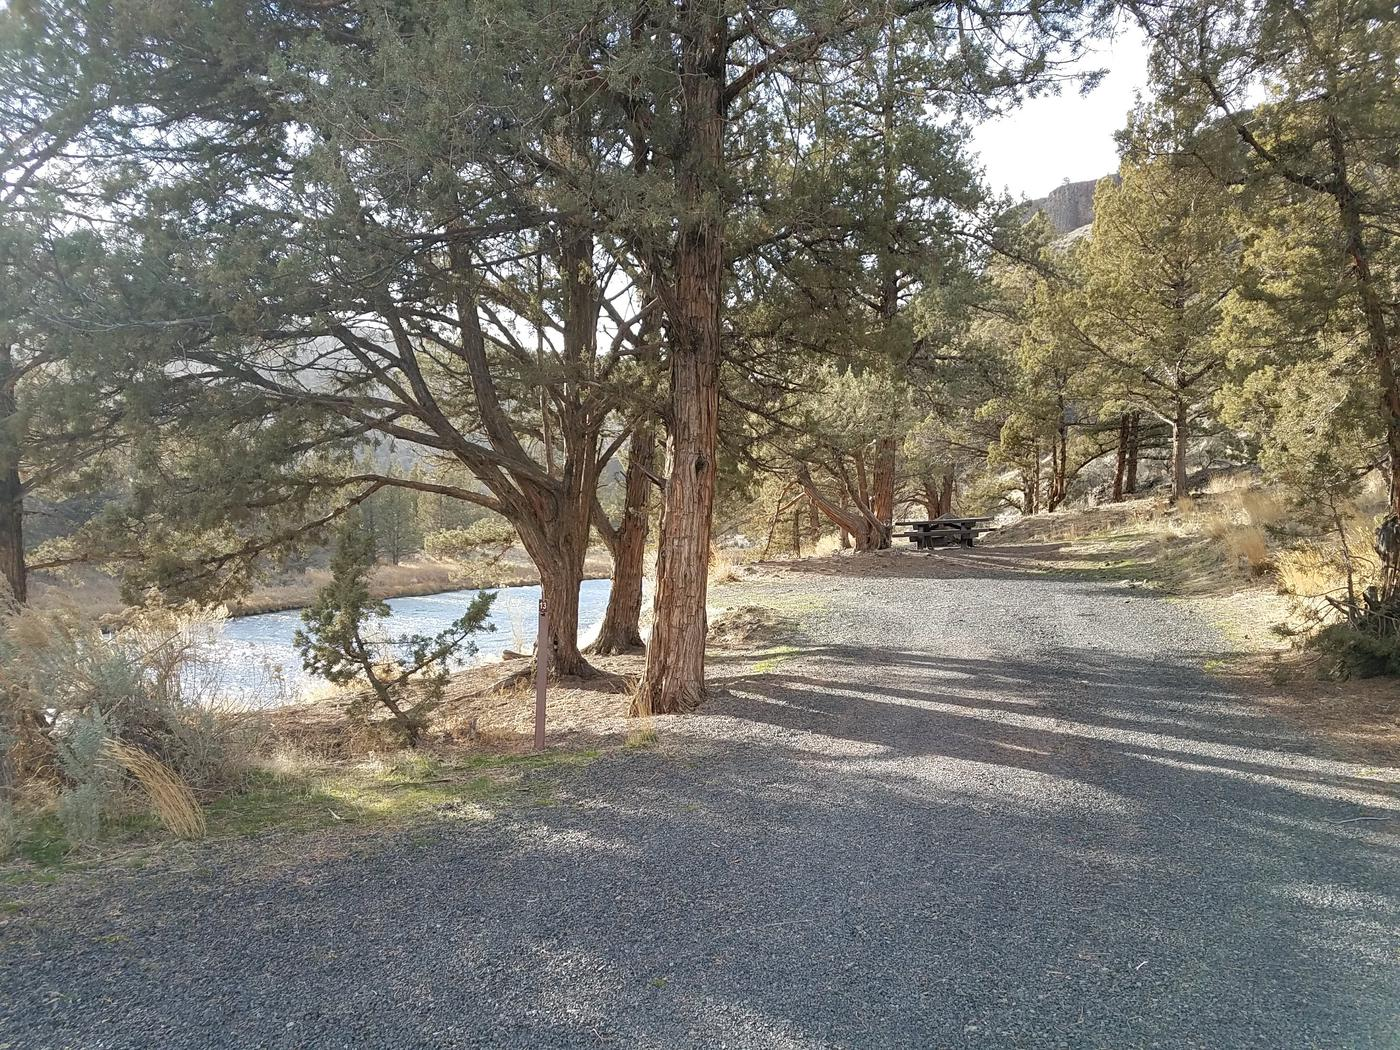 View of road at Palisades Campground